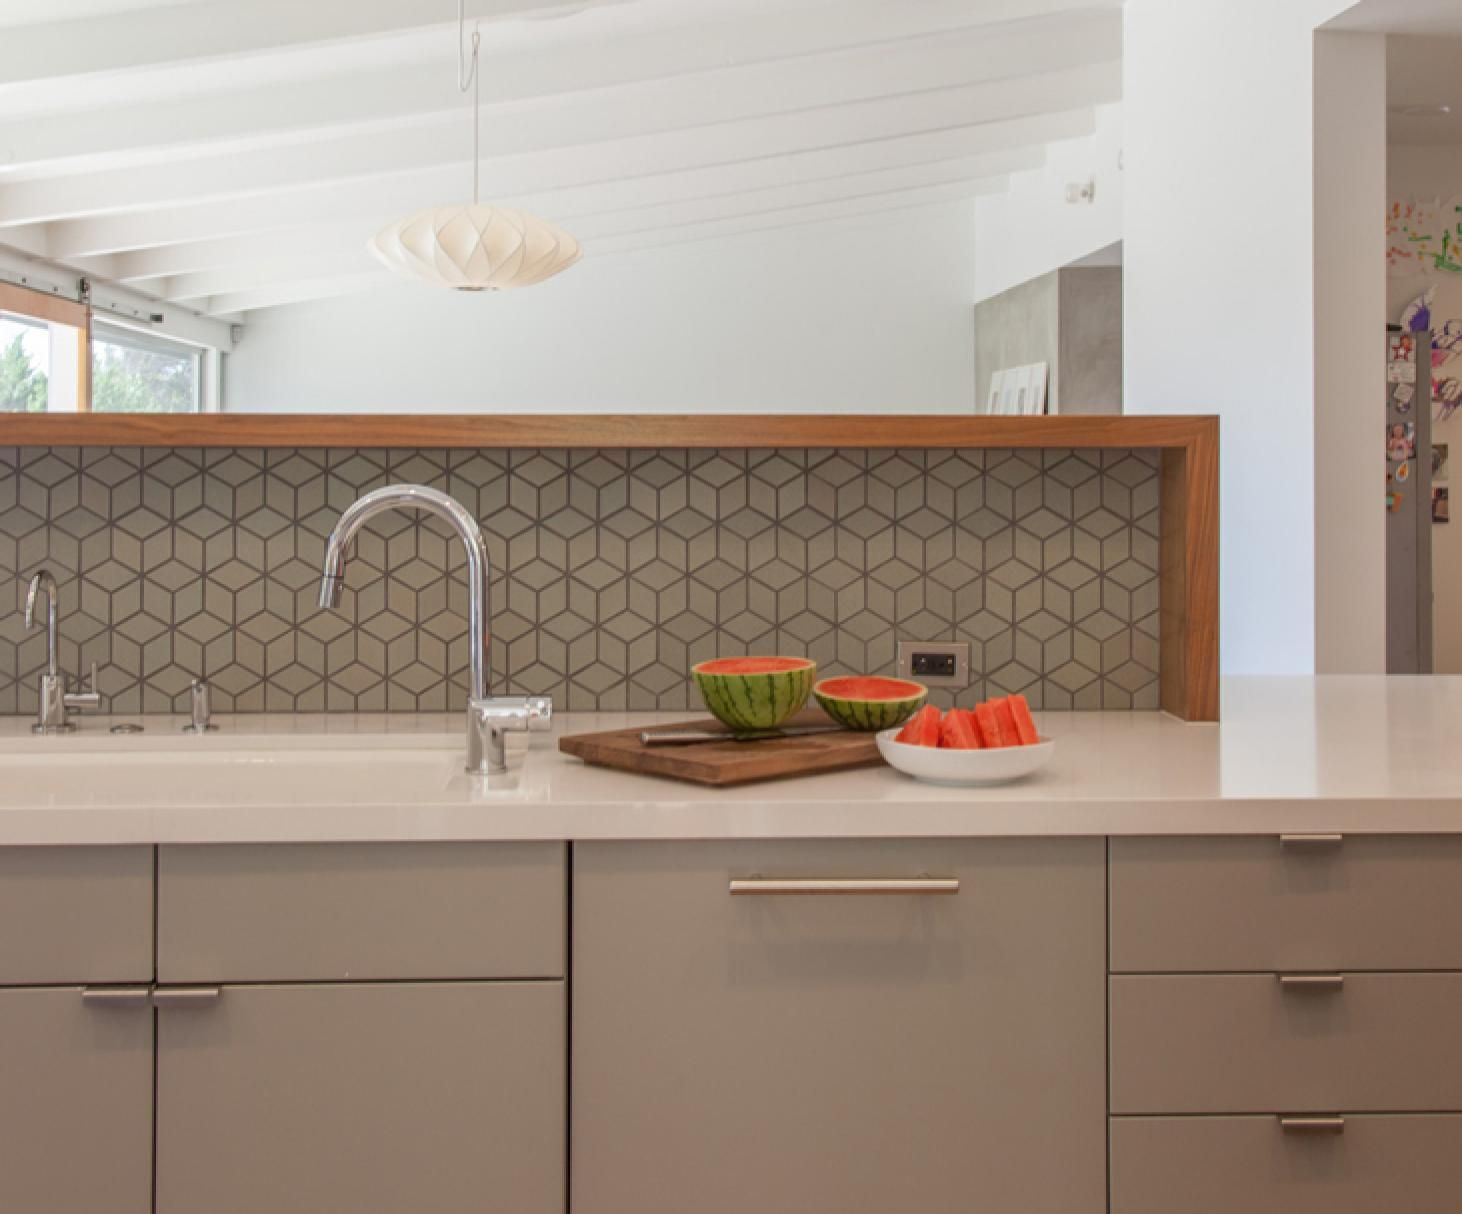 Installation Inspiration - Heath Ceramics   House